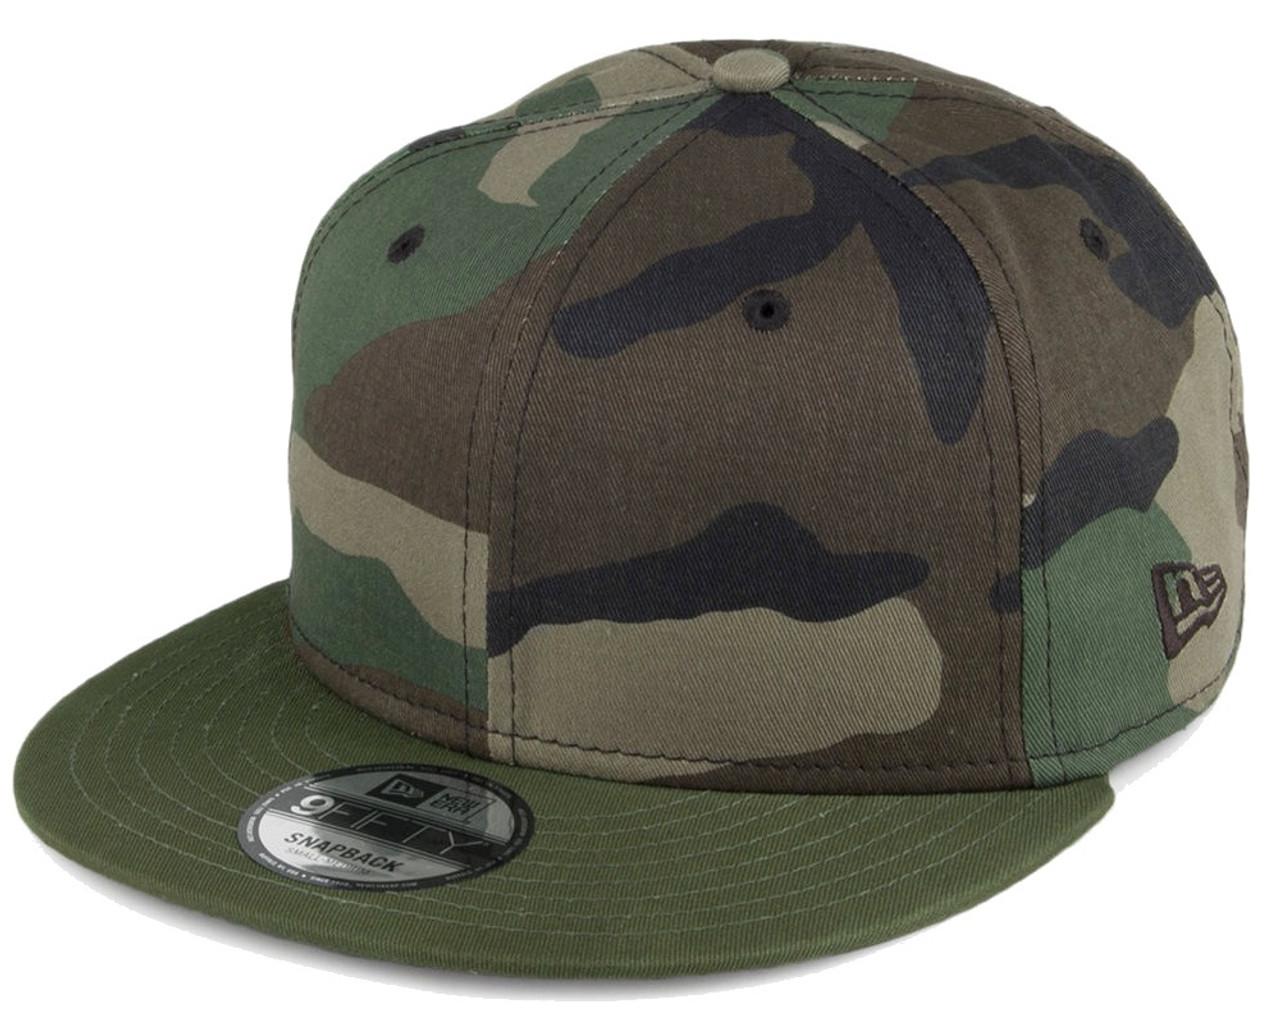 Plain Blank Camo New Era 9fifty Snapback Hat With